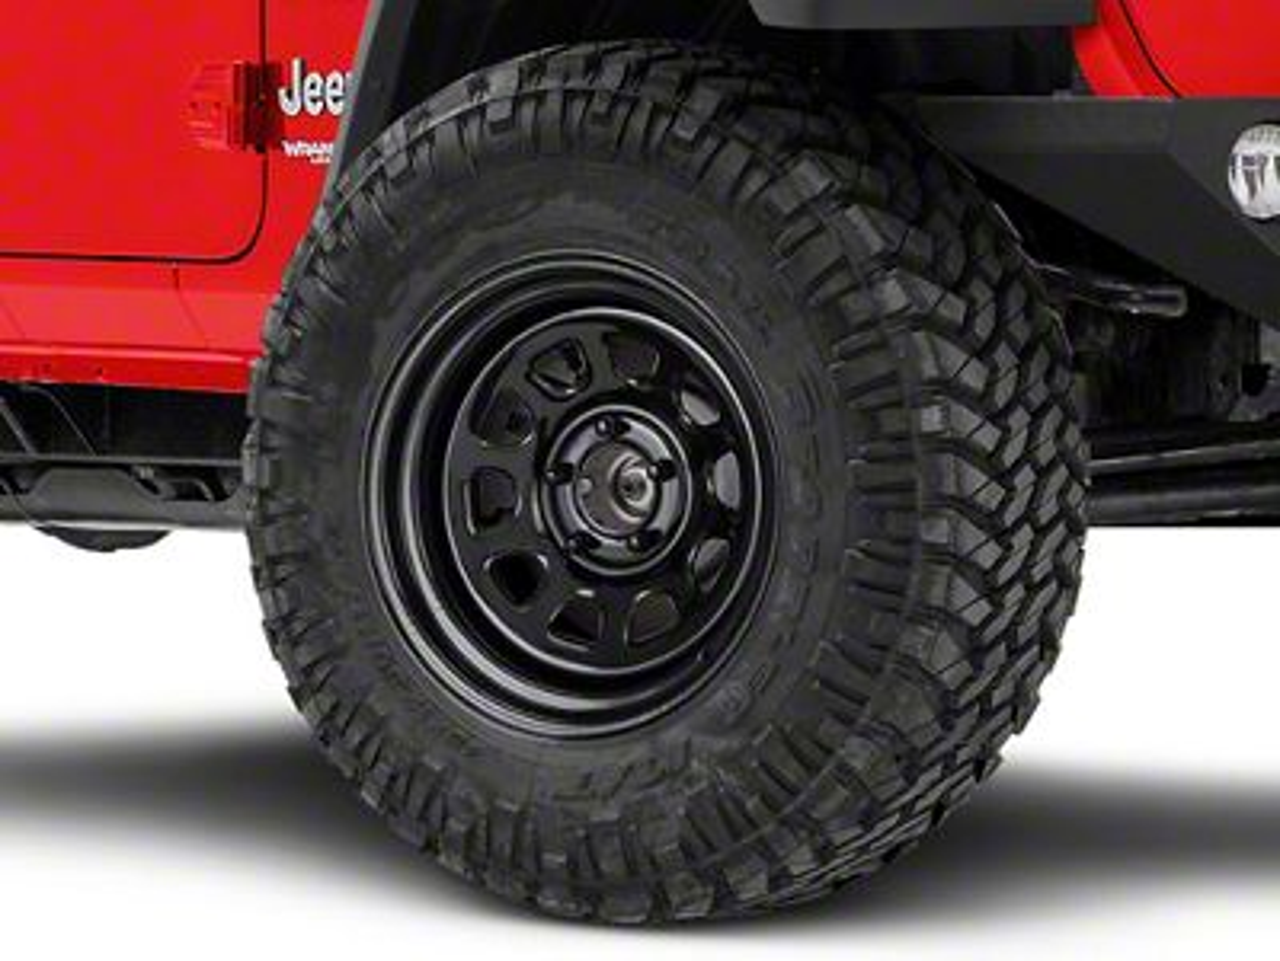 Pro Comp Steel Wheels Jeep Wrangler District Gloss Black Wheel 17x9 51 7973 18 21 Jeep Wrangler Jl